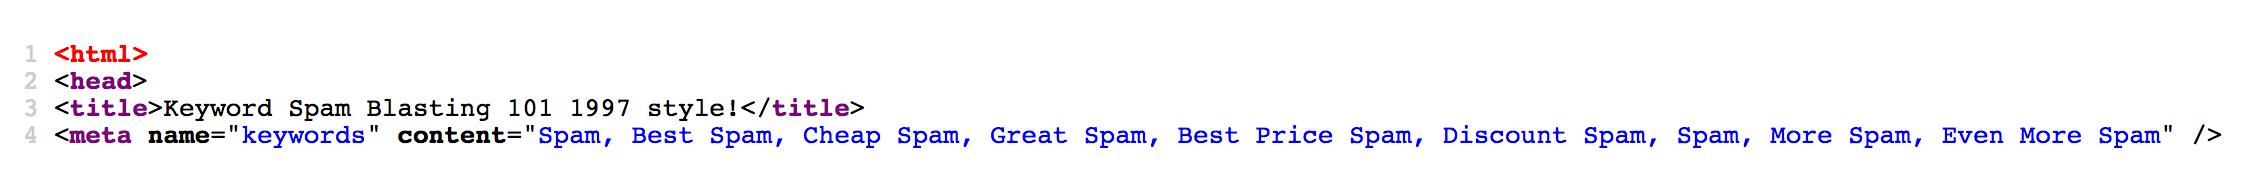 meta keyword spam example